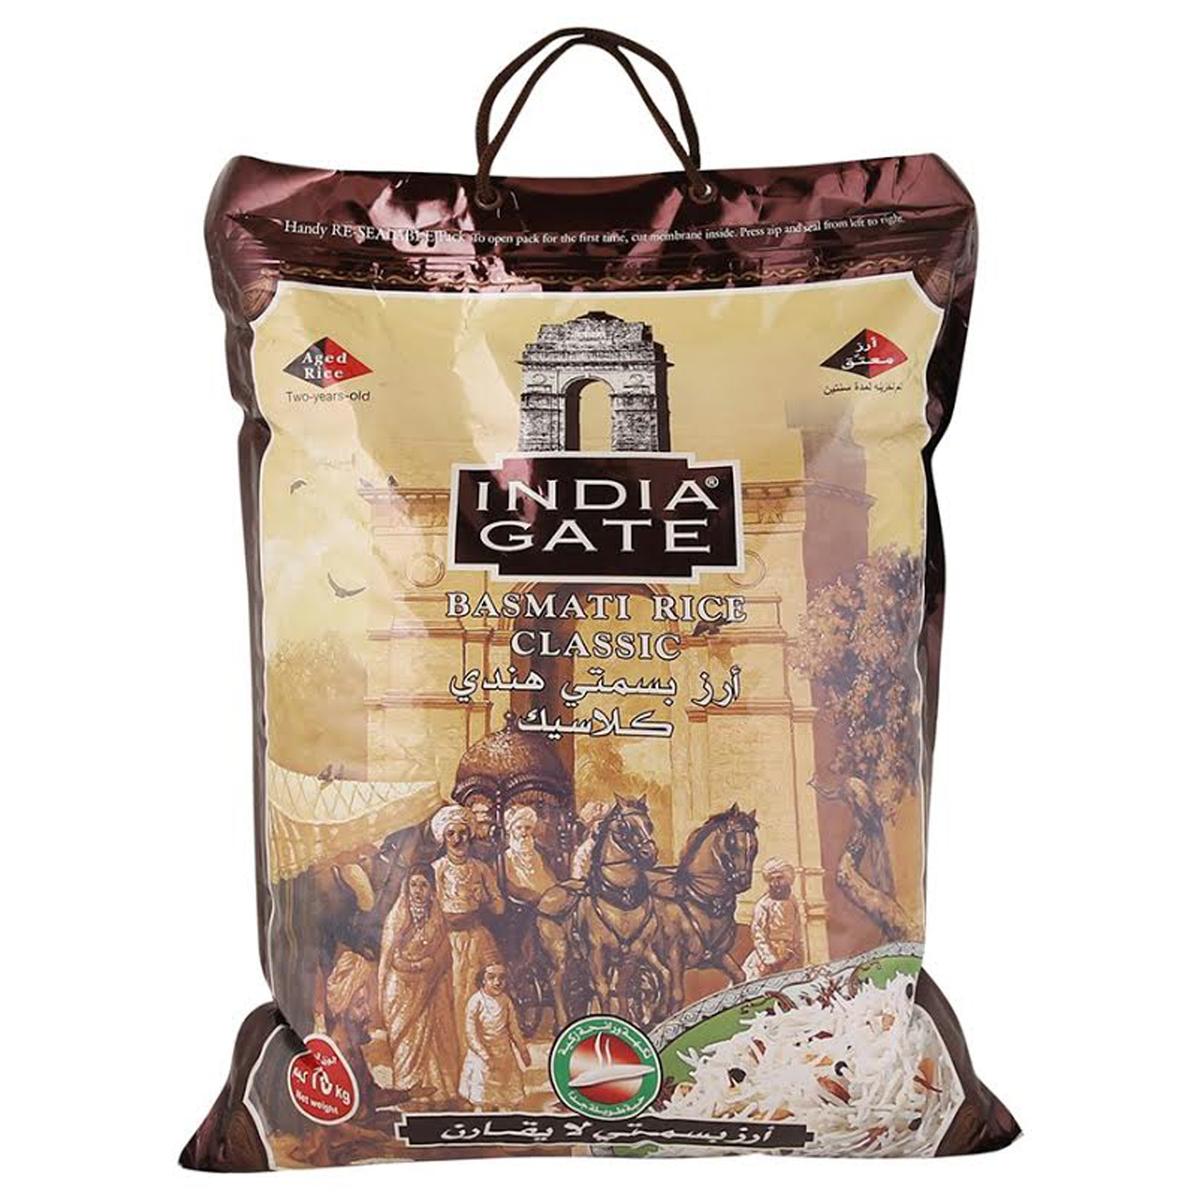 Buy India Gate Basmati Rice Classic 10kg - Basmati - Lulu